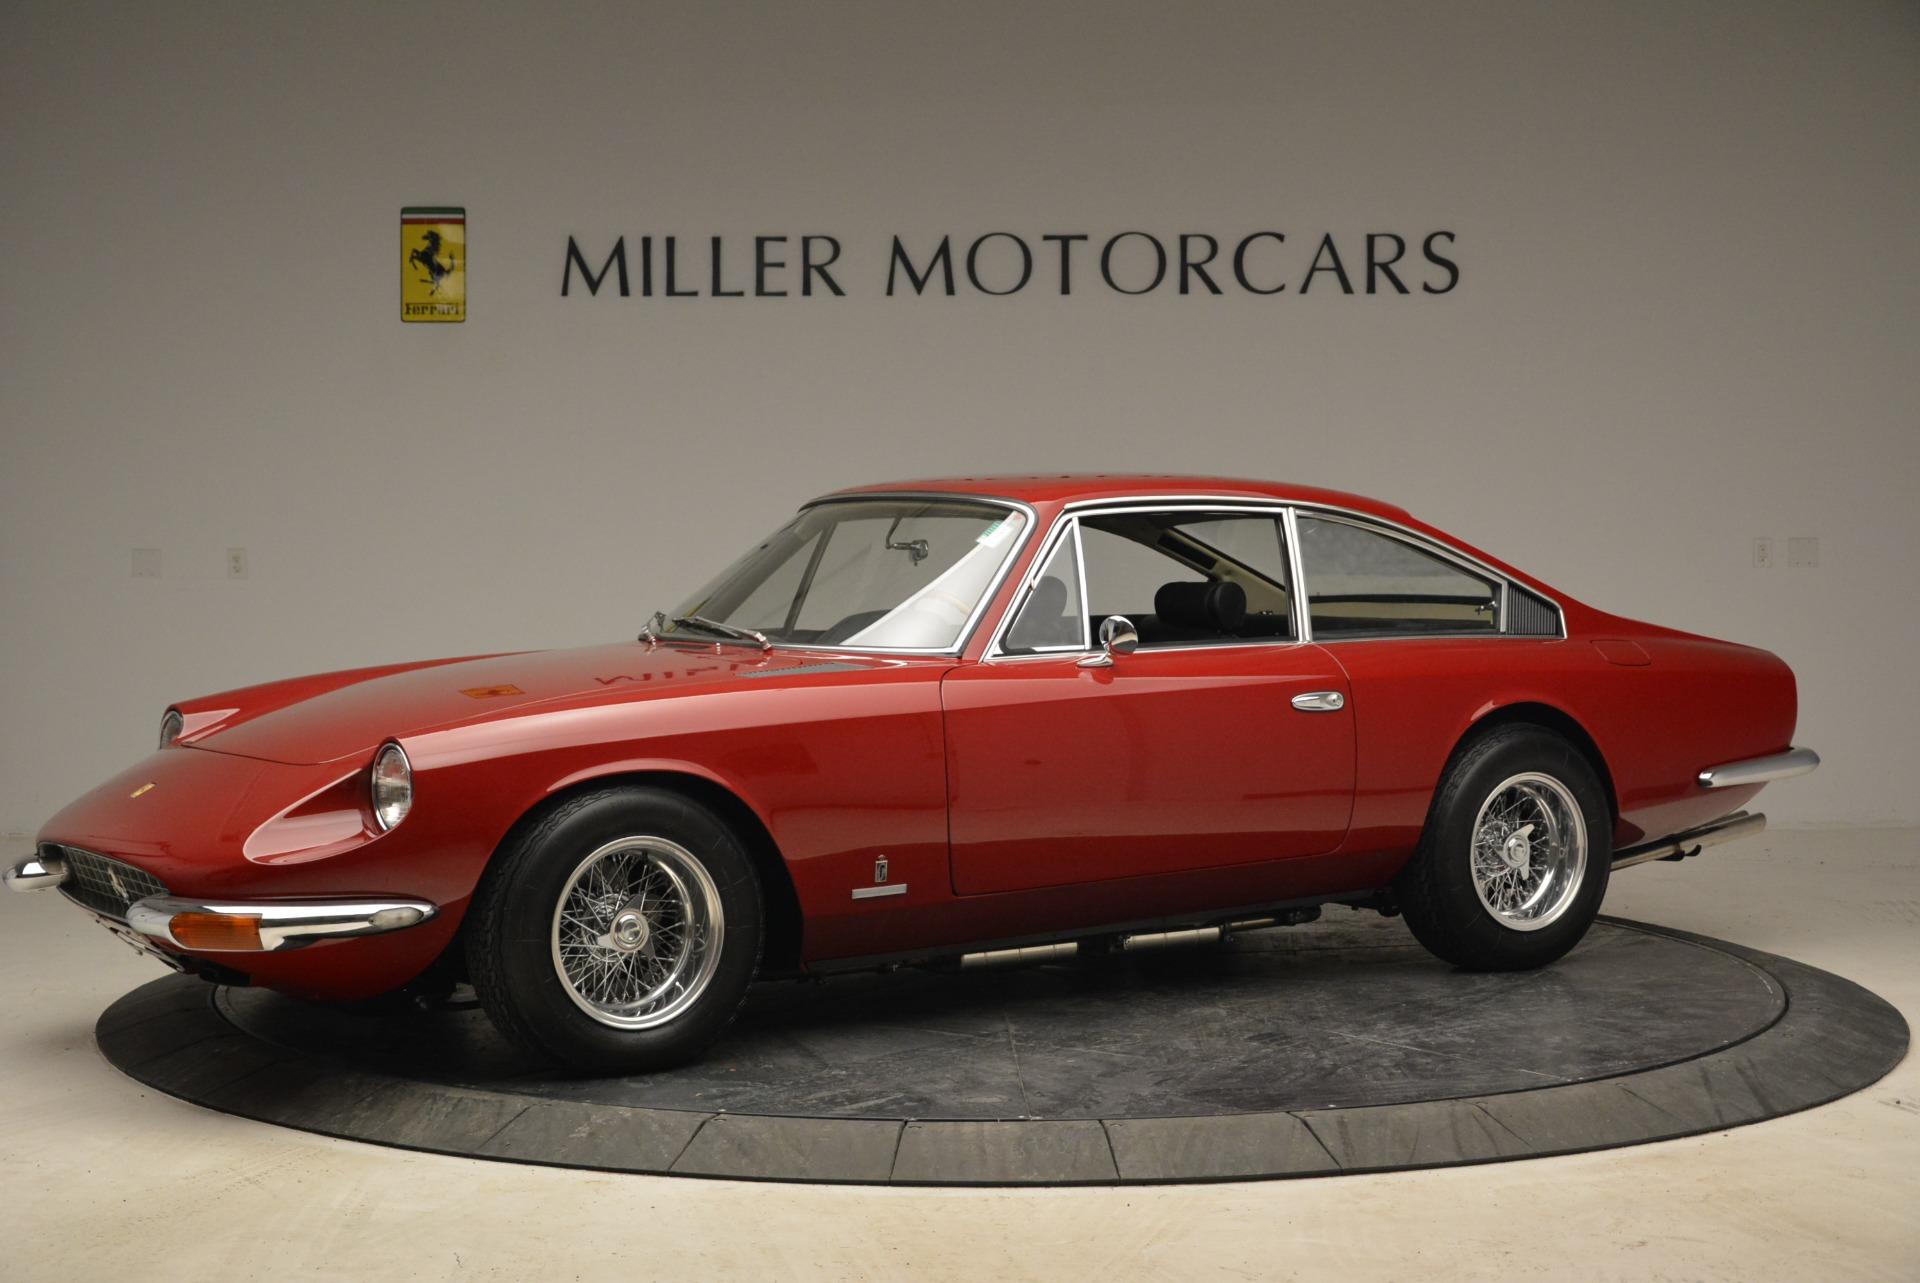 Used 1969 Ferrari 365 GT 2+2  For Sale In Greenwich, CT 1995_p2